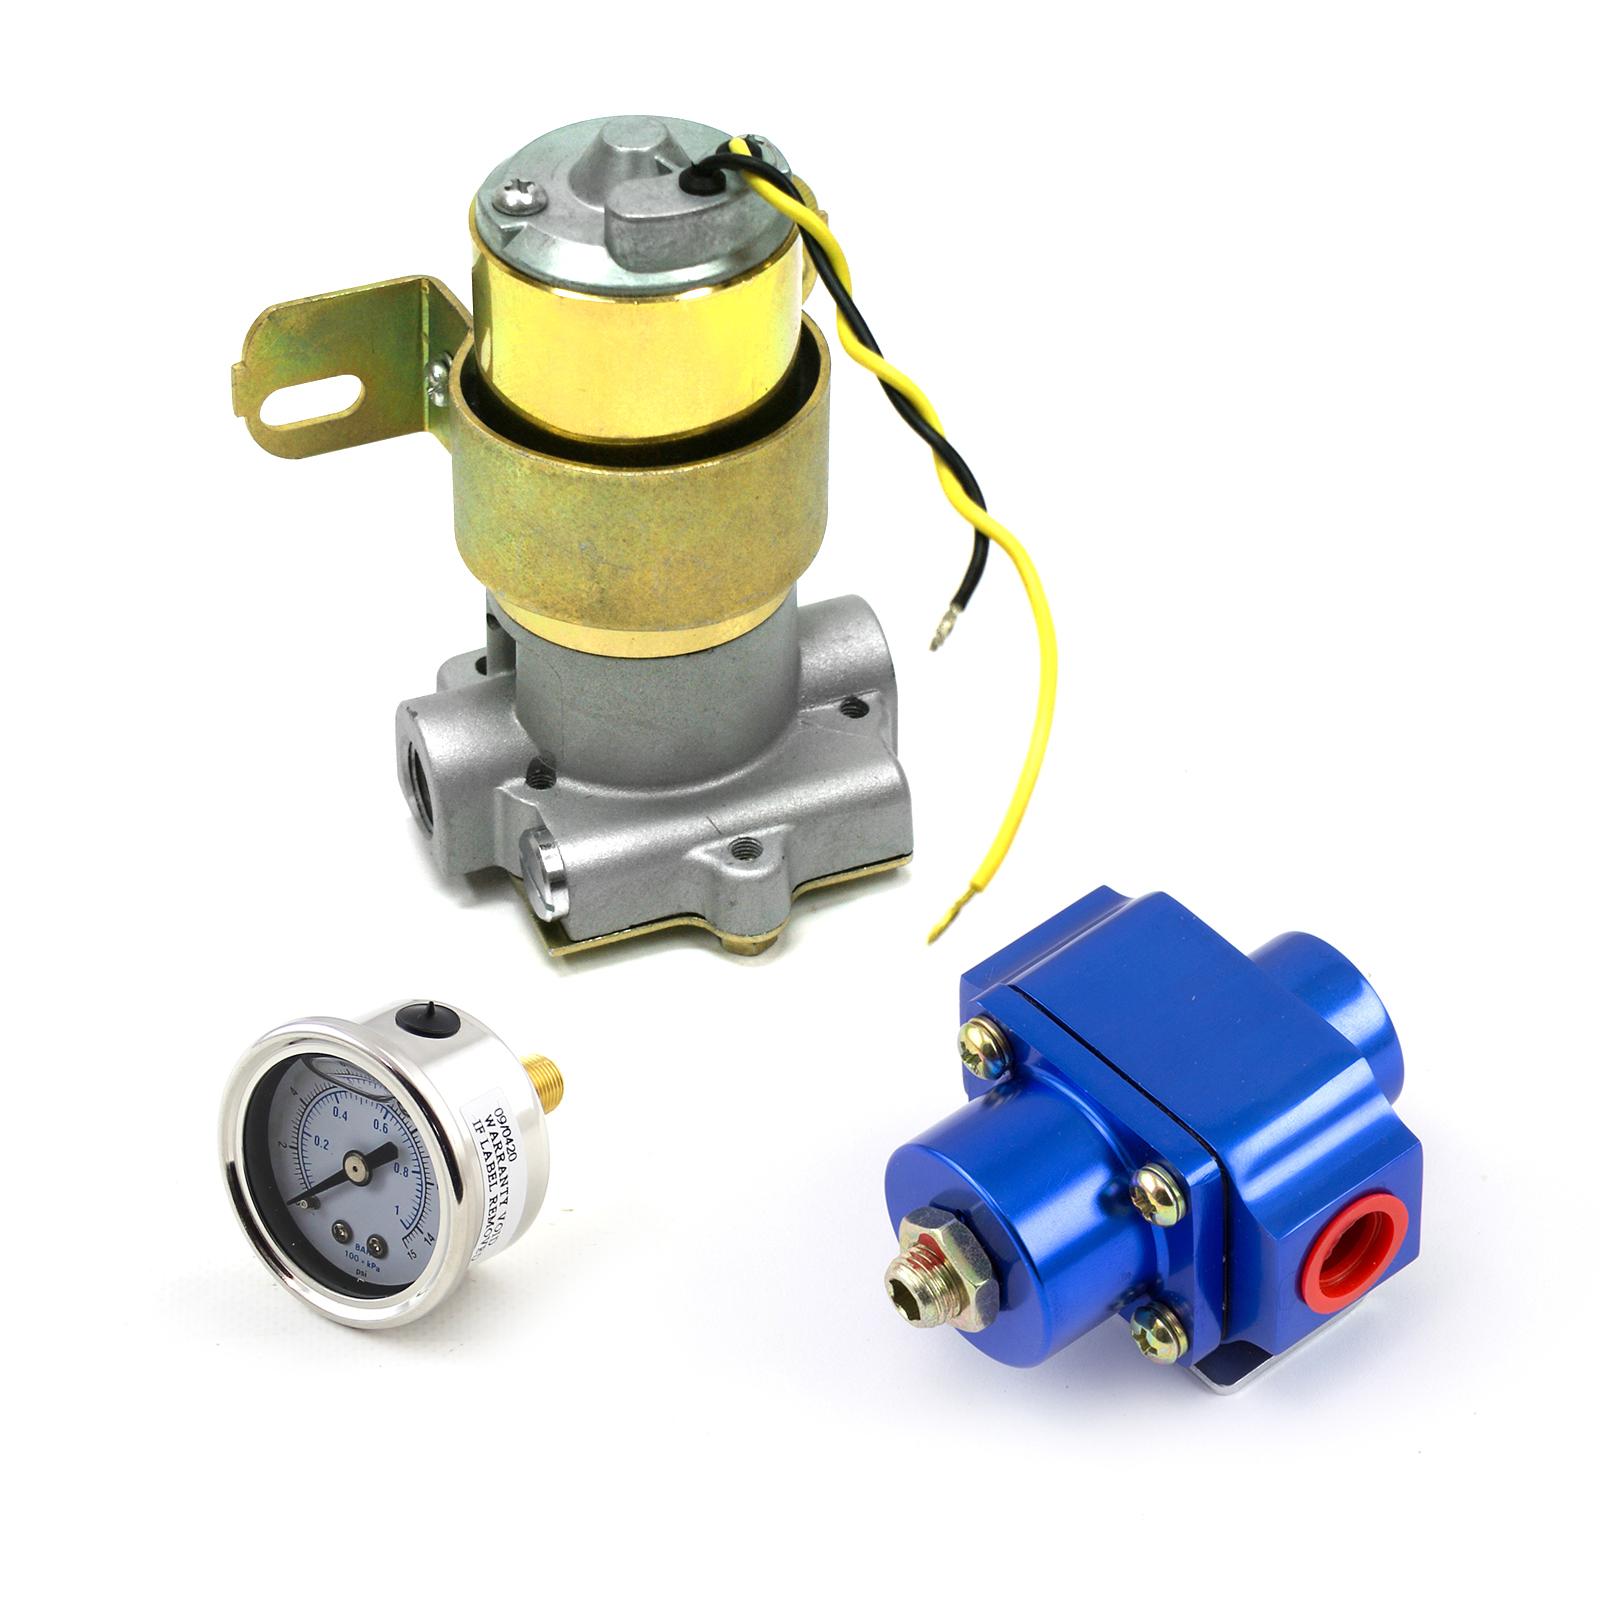 110 Gph Universal Electric Fuel Pump Blue Regulator & Gauge Combo Kit